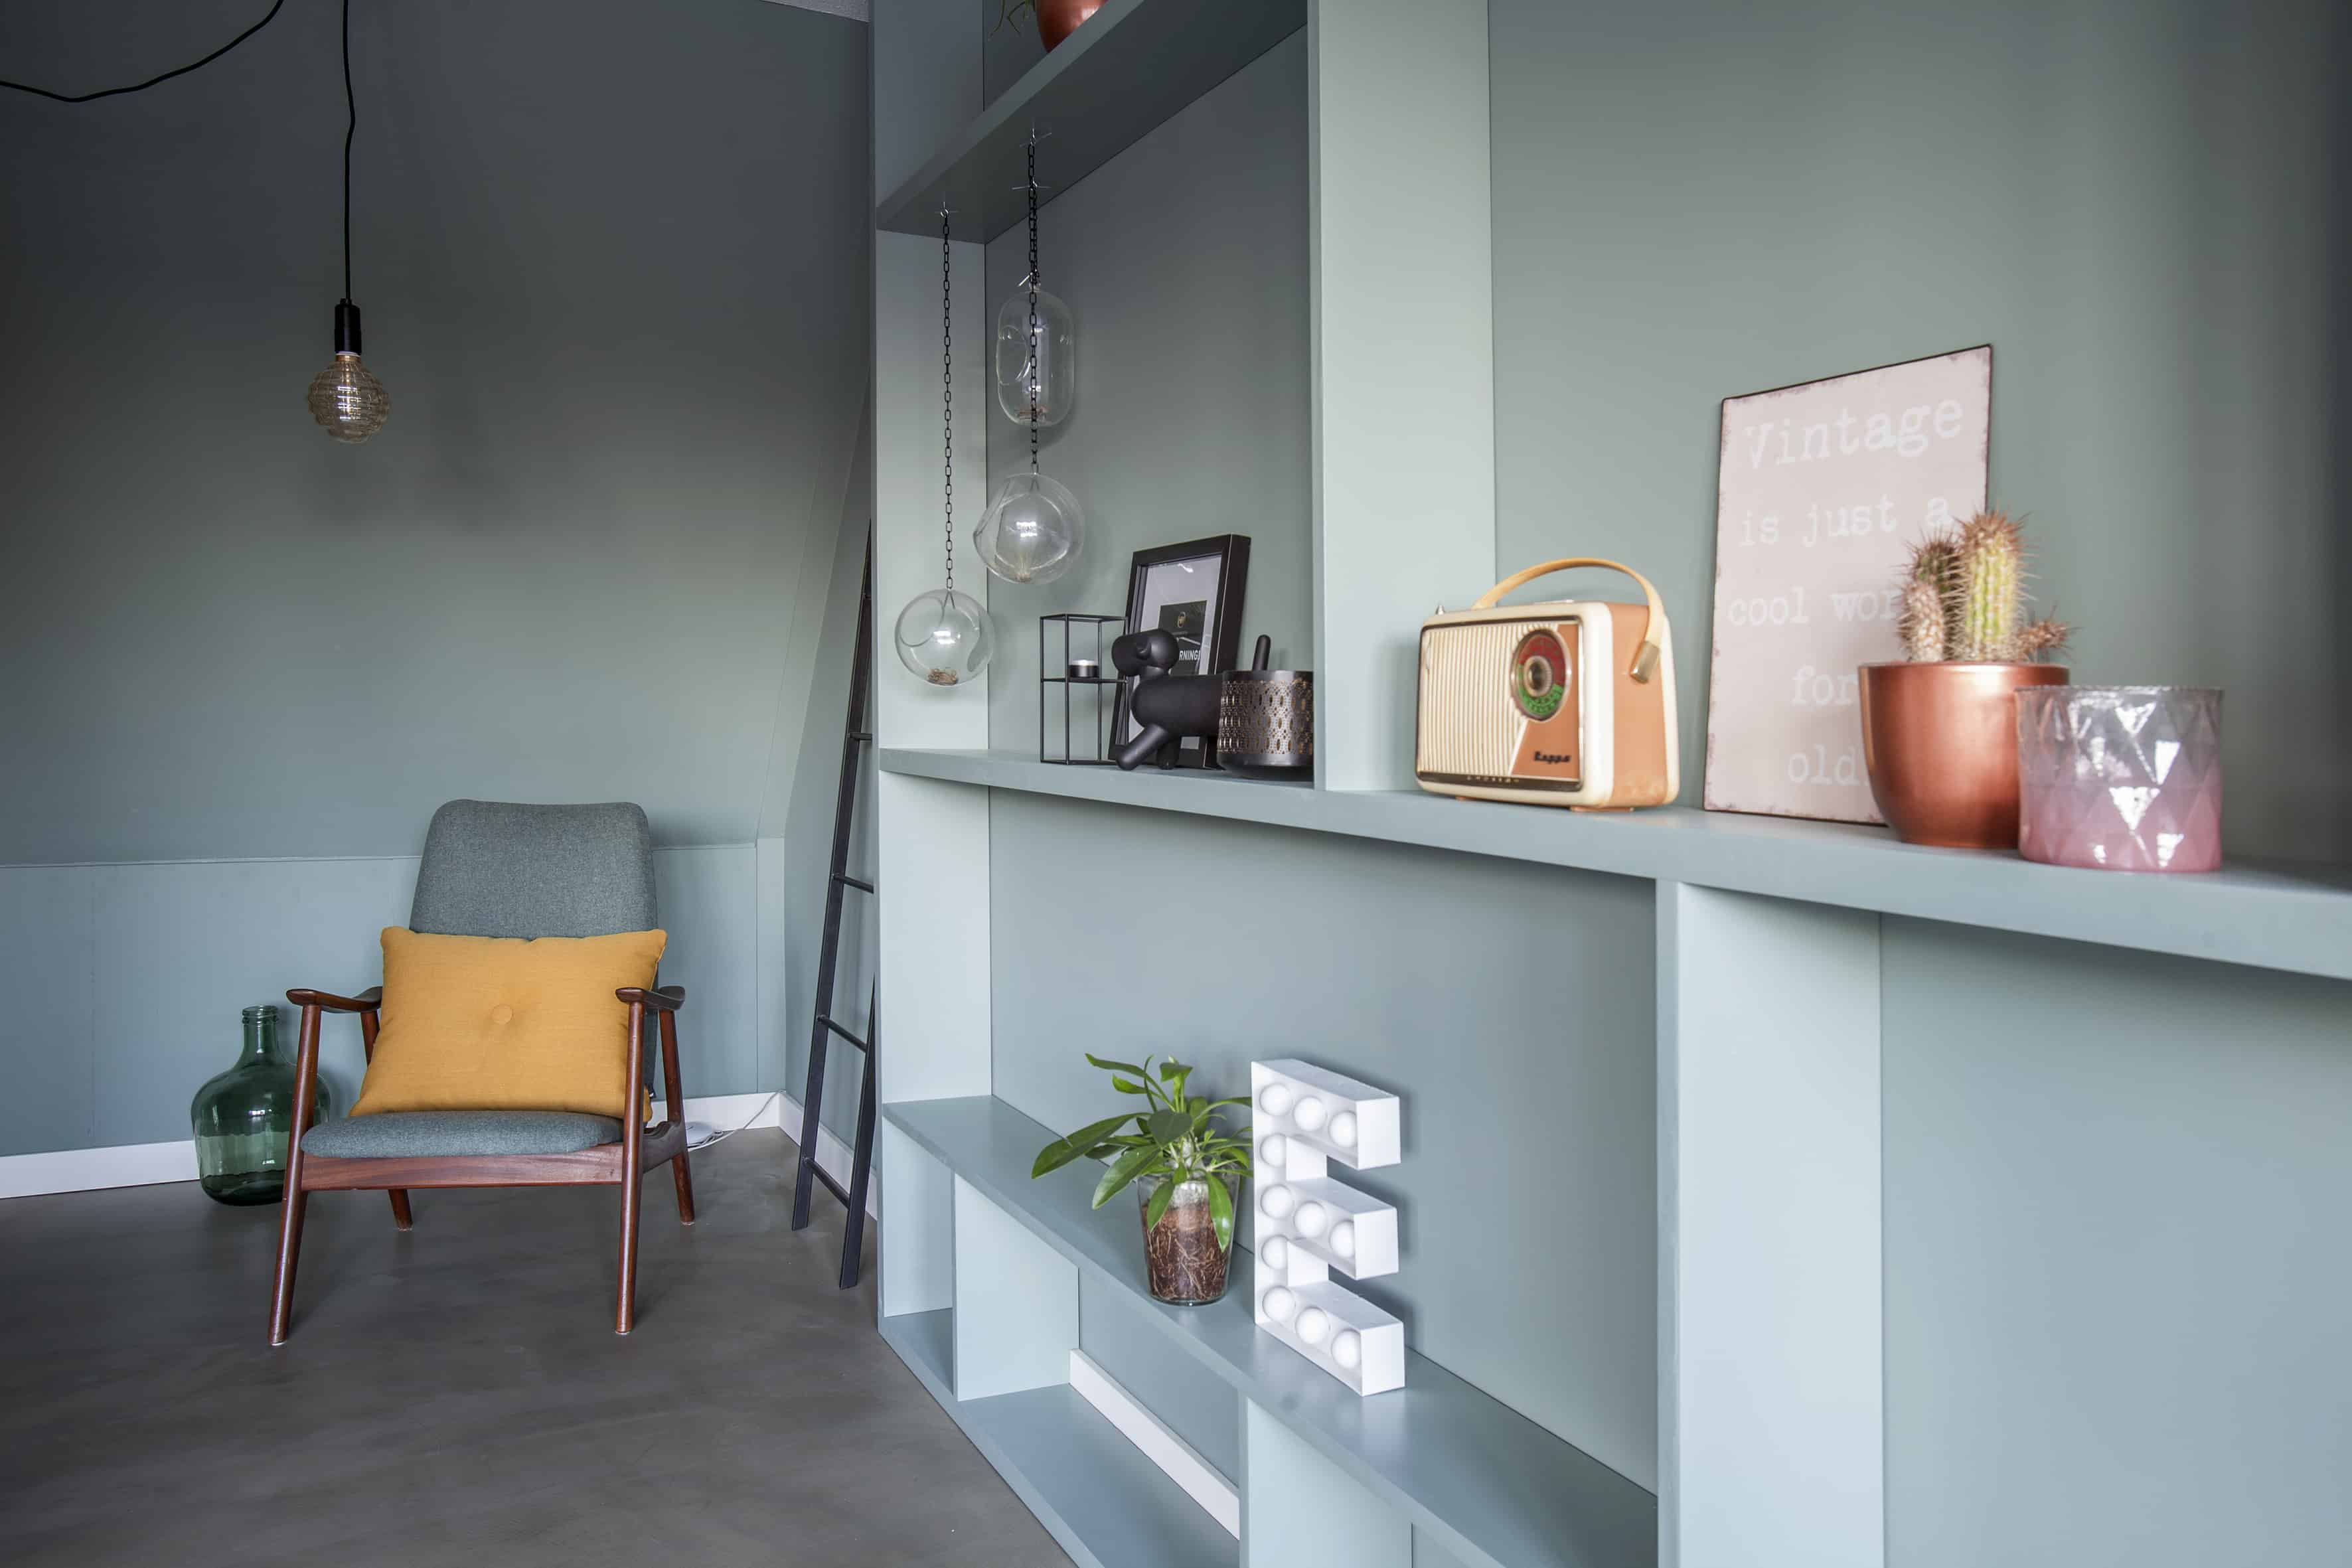 reuzenletterbak-styling-interieurontwerp-slaapkamer-histor-cassave-egalisatievloer